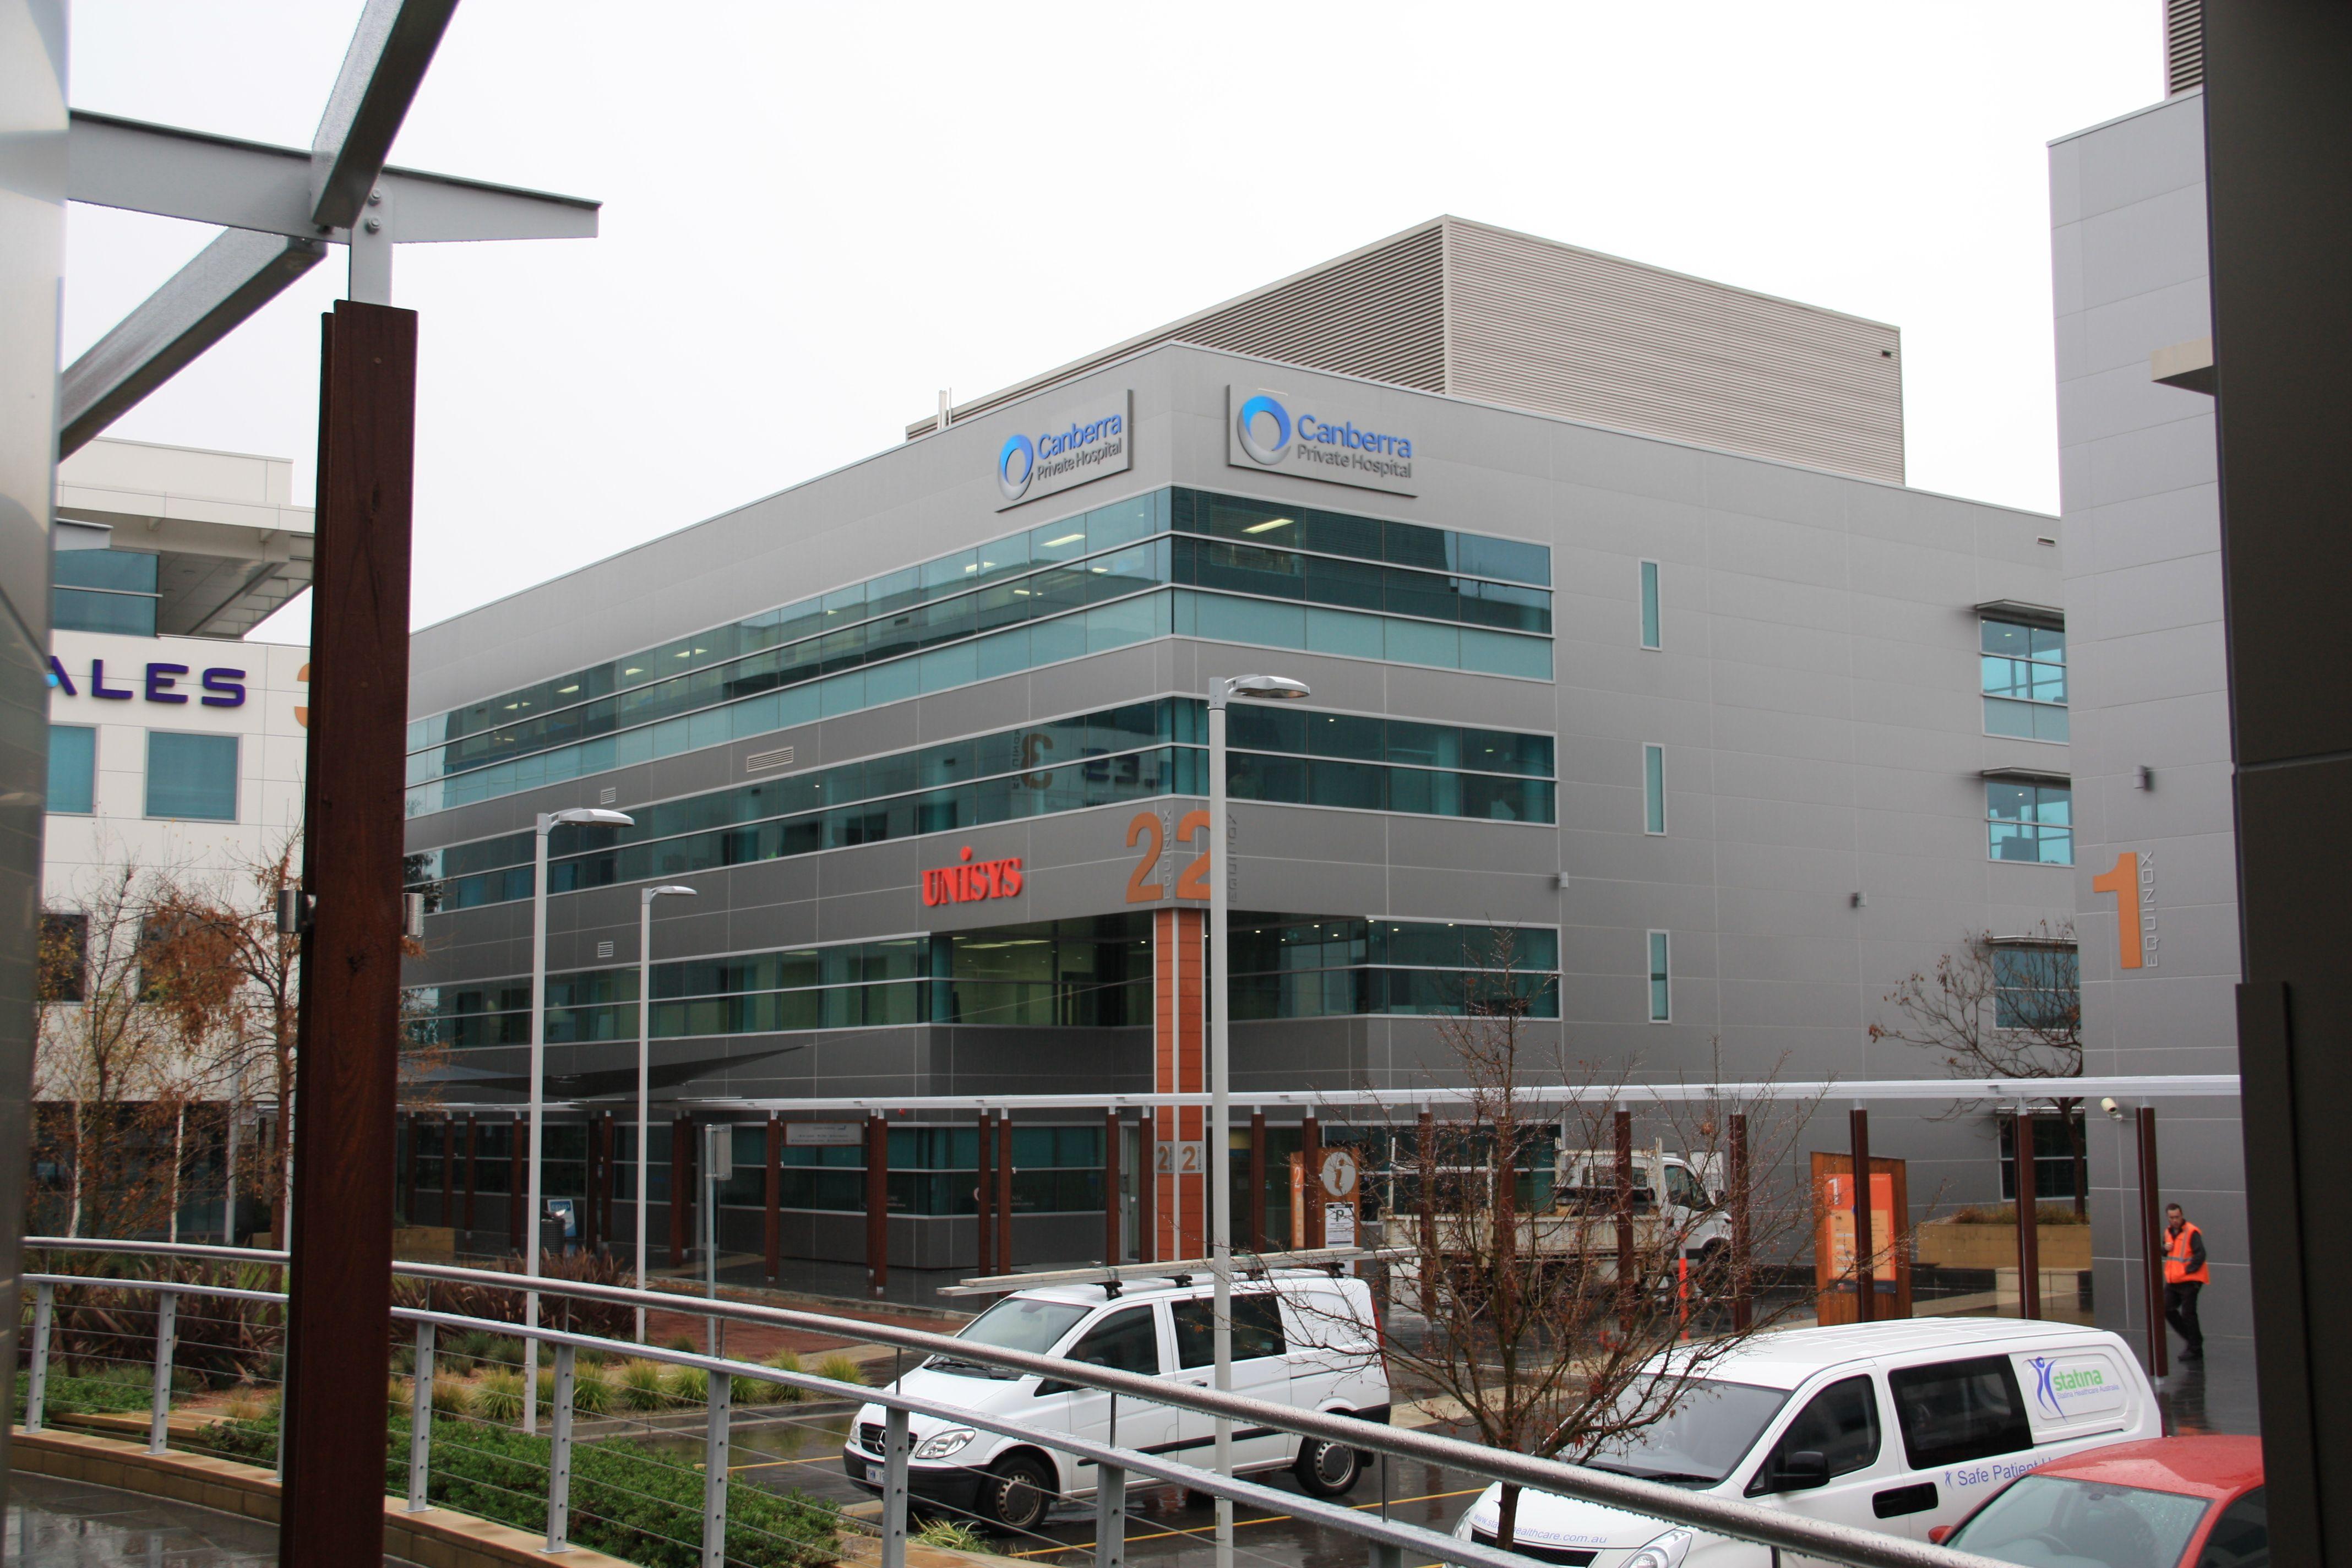 sydneys medical school feature - HD4272×2848